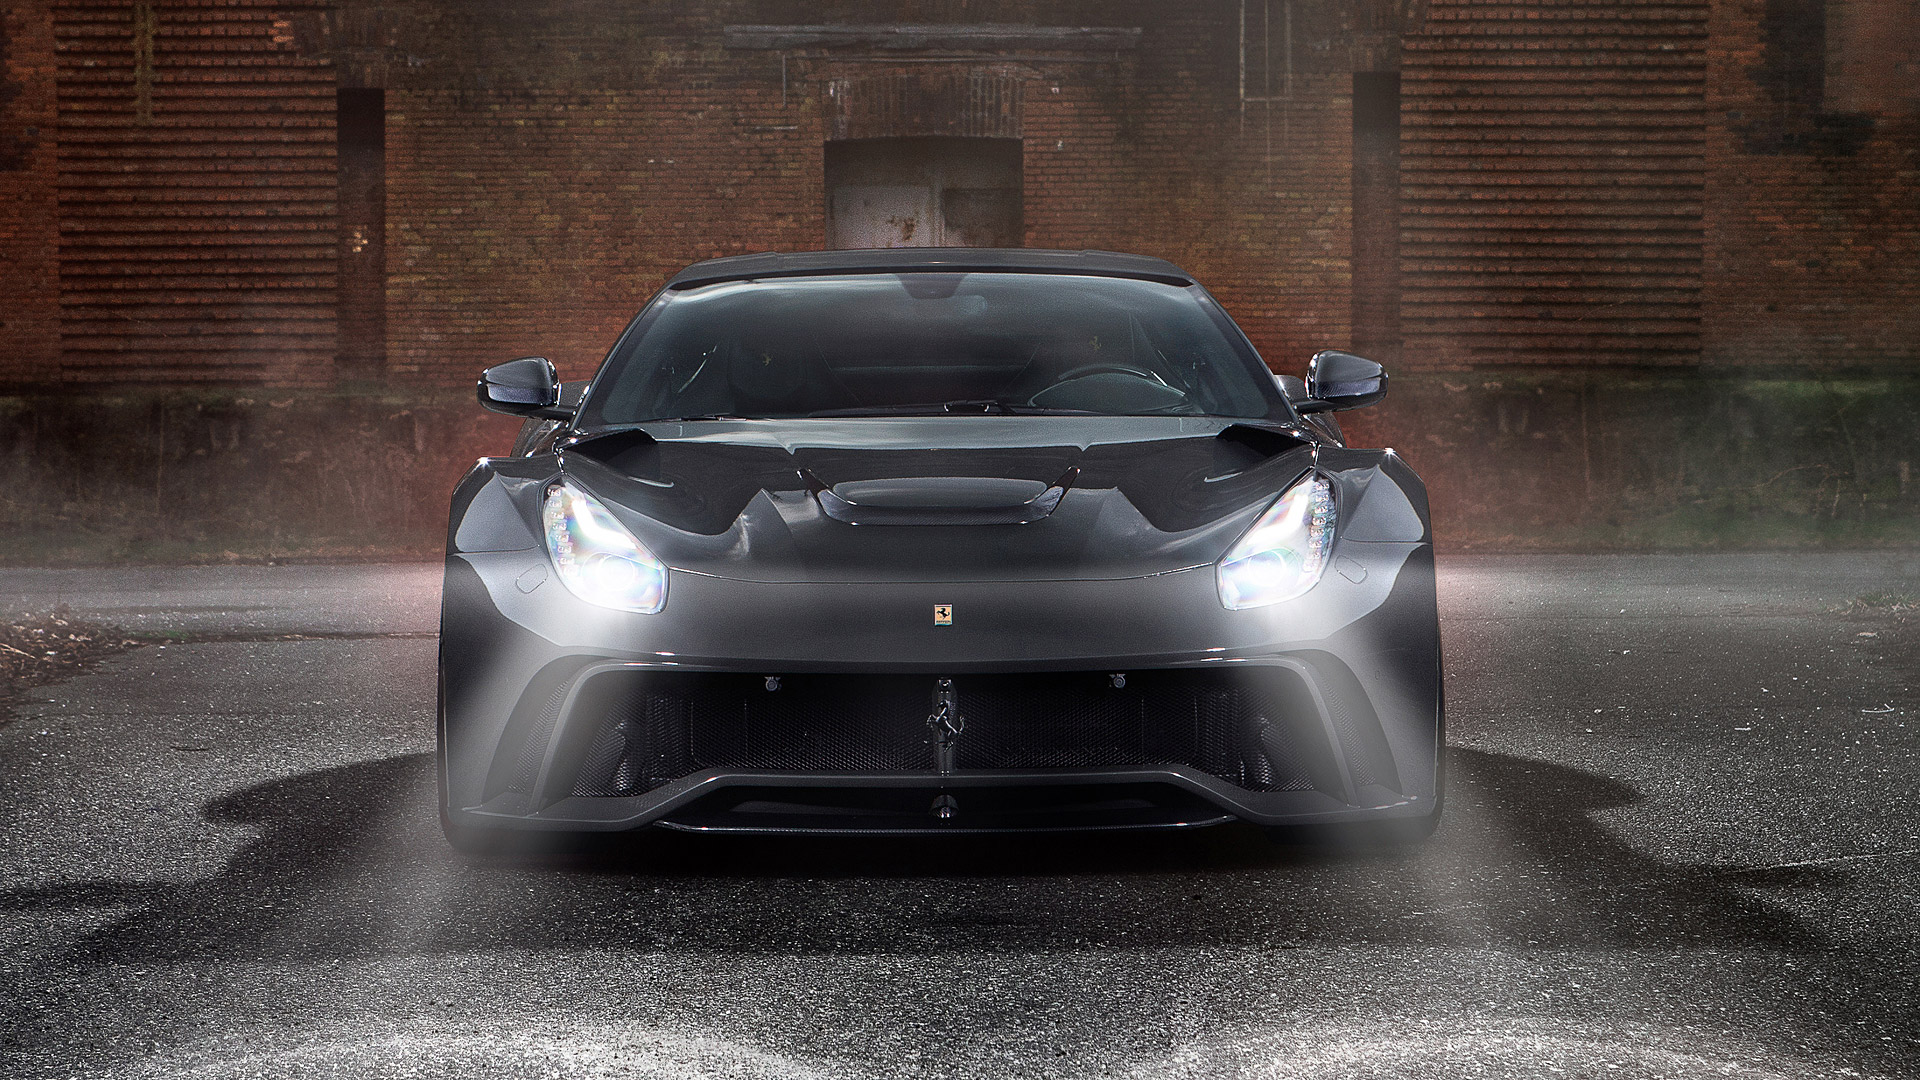 2016 Novitec Rosso Ferrari F12 N Lago S Wallpapers HD Images 1920x1080